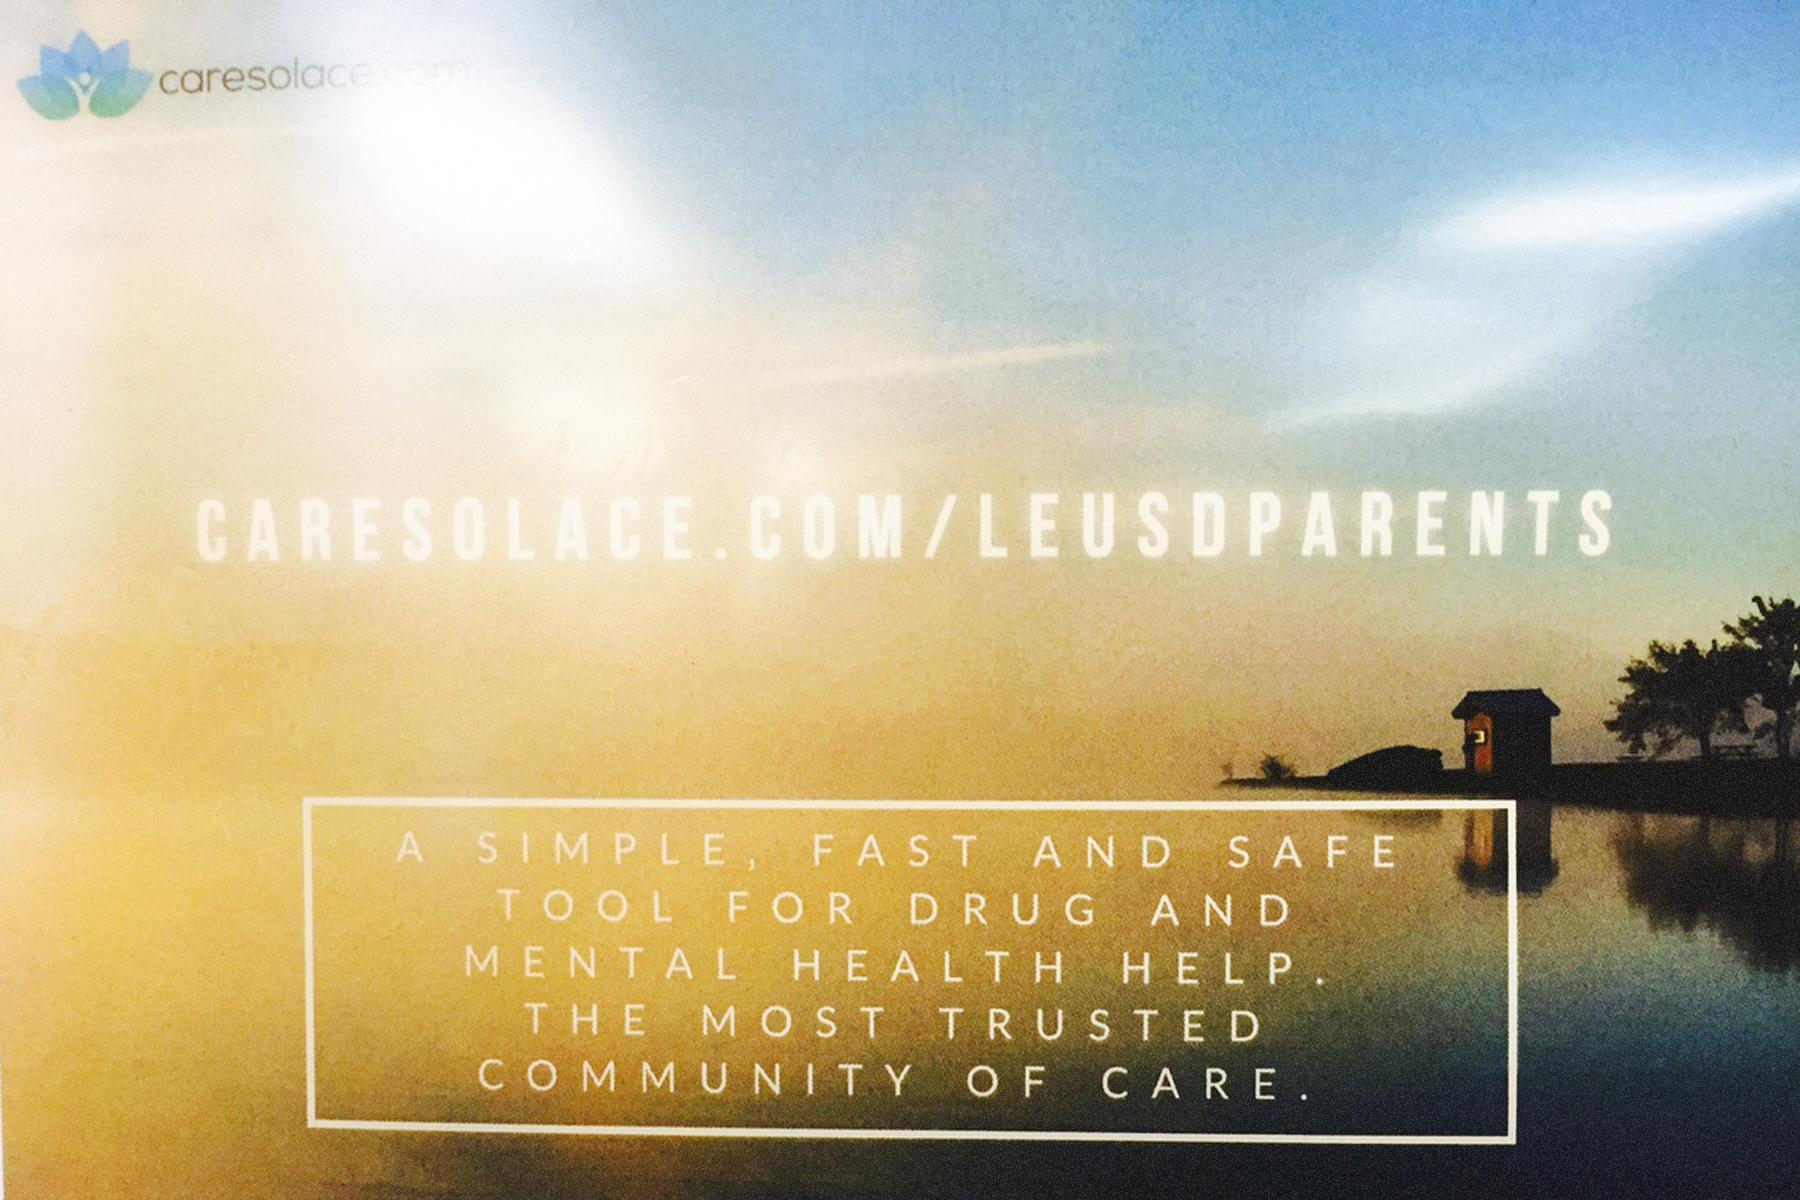 web site for mental health services at Caresolace.com/leusdparents